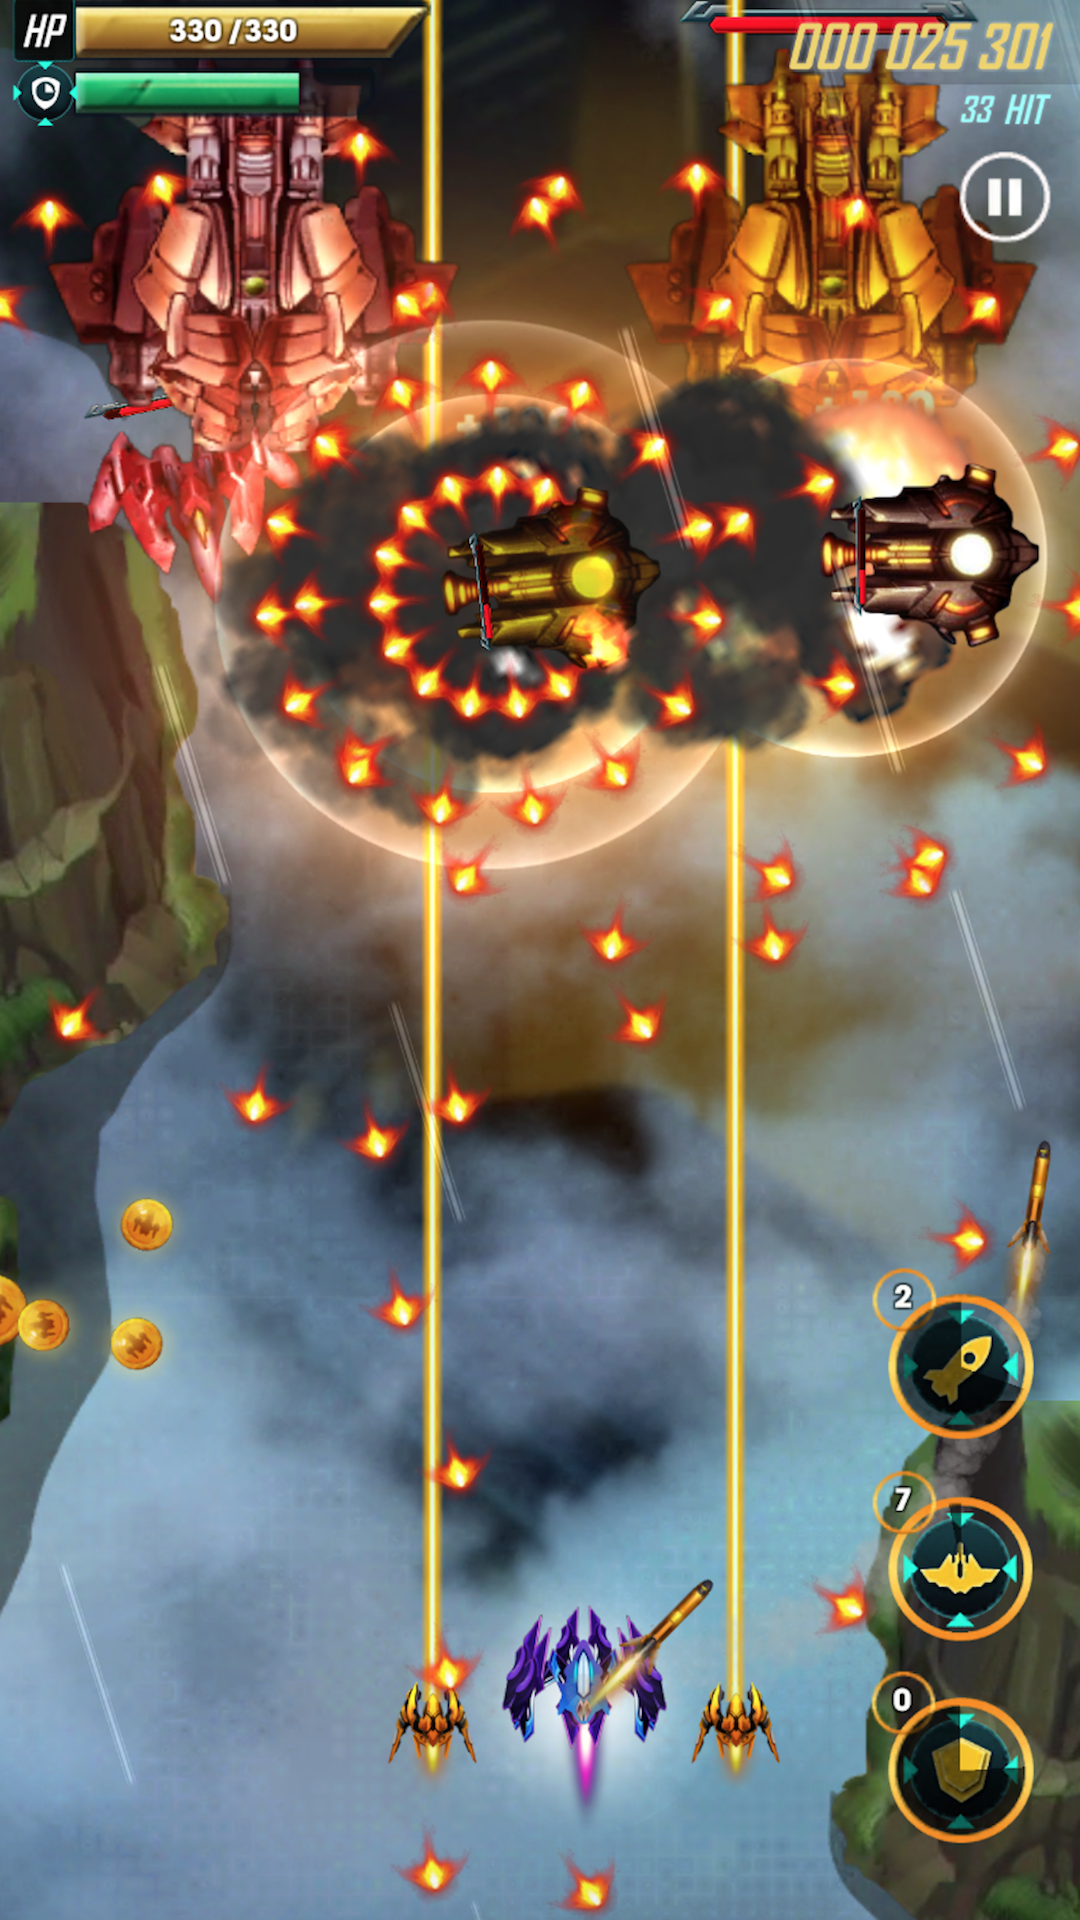 Galaxy Sky Strike Force - Space Invaders Alien Shooter